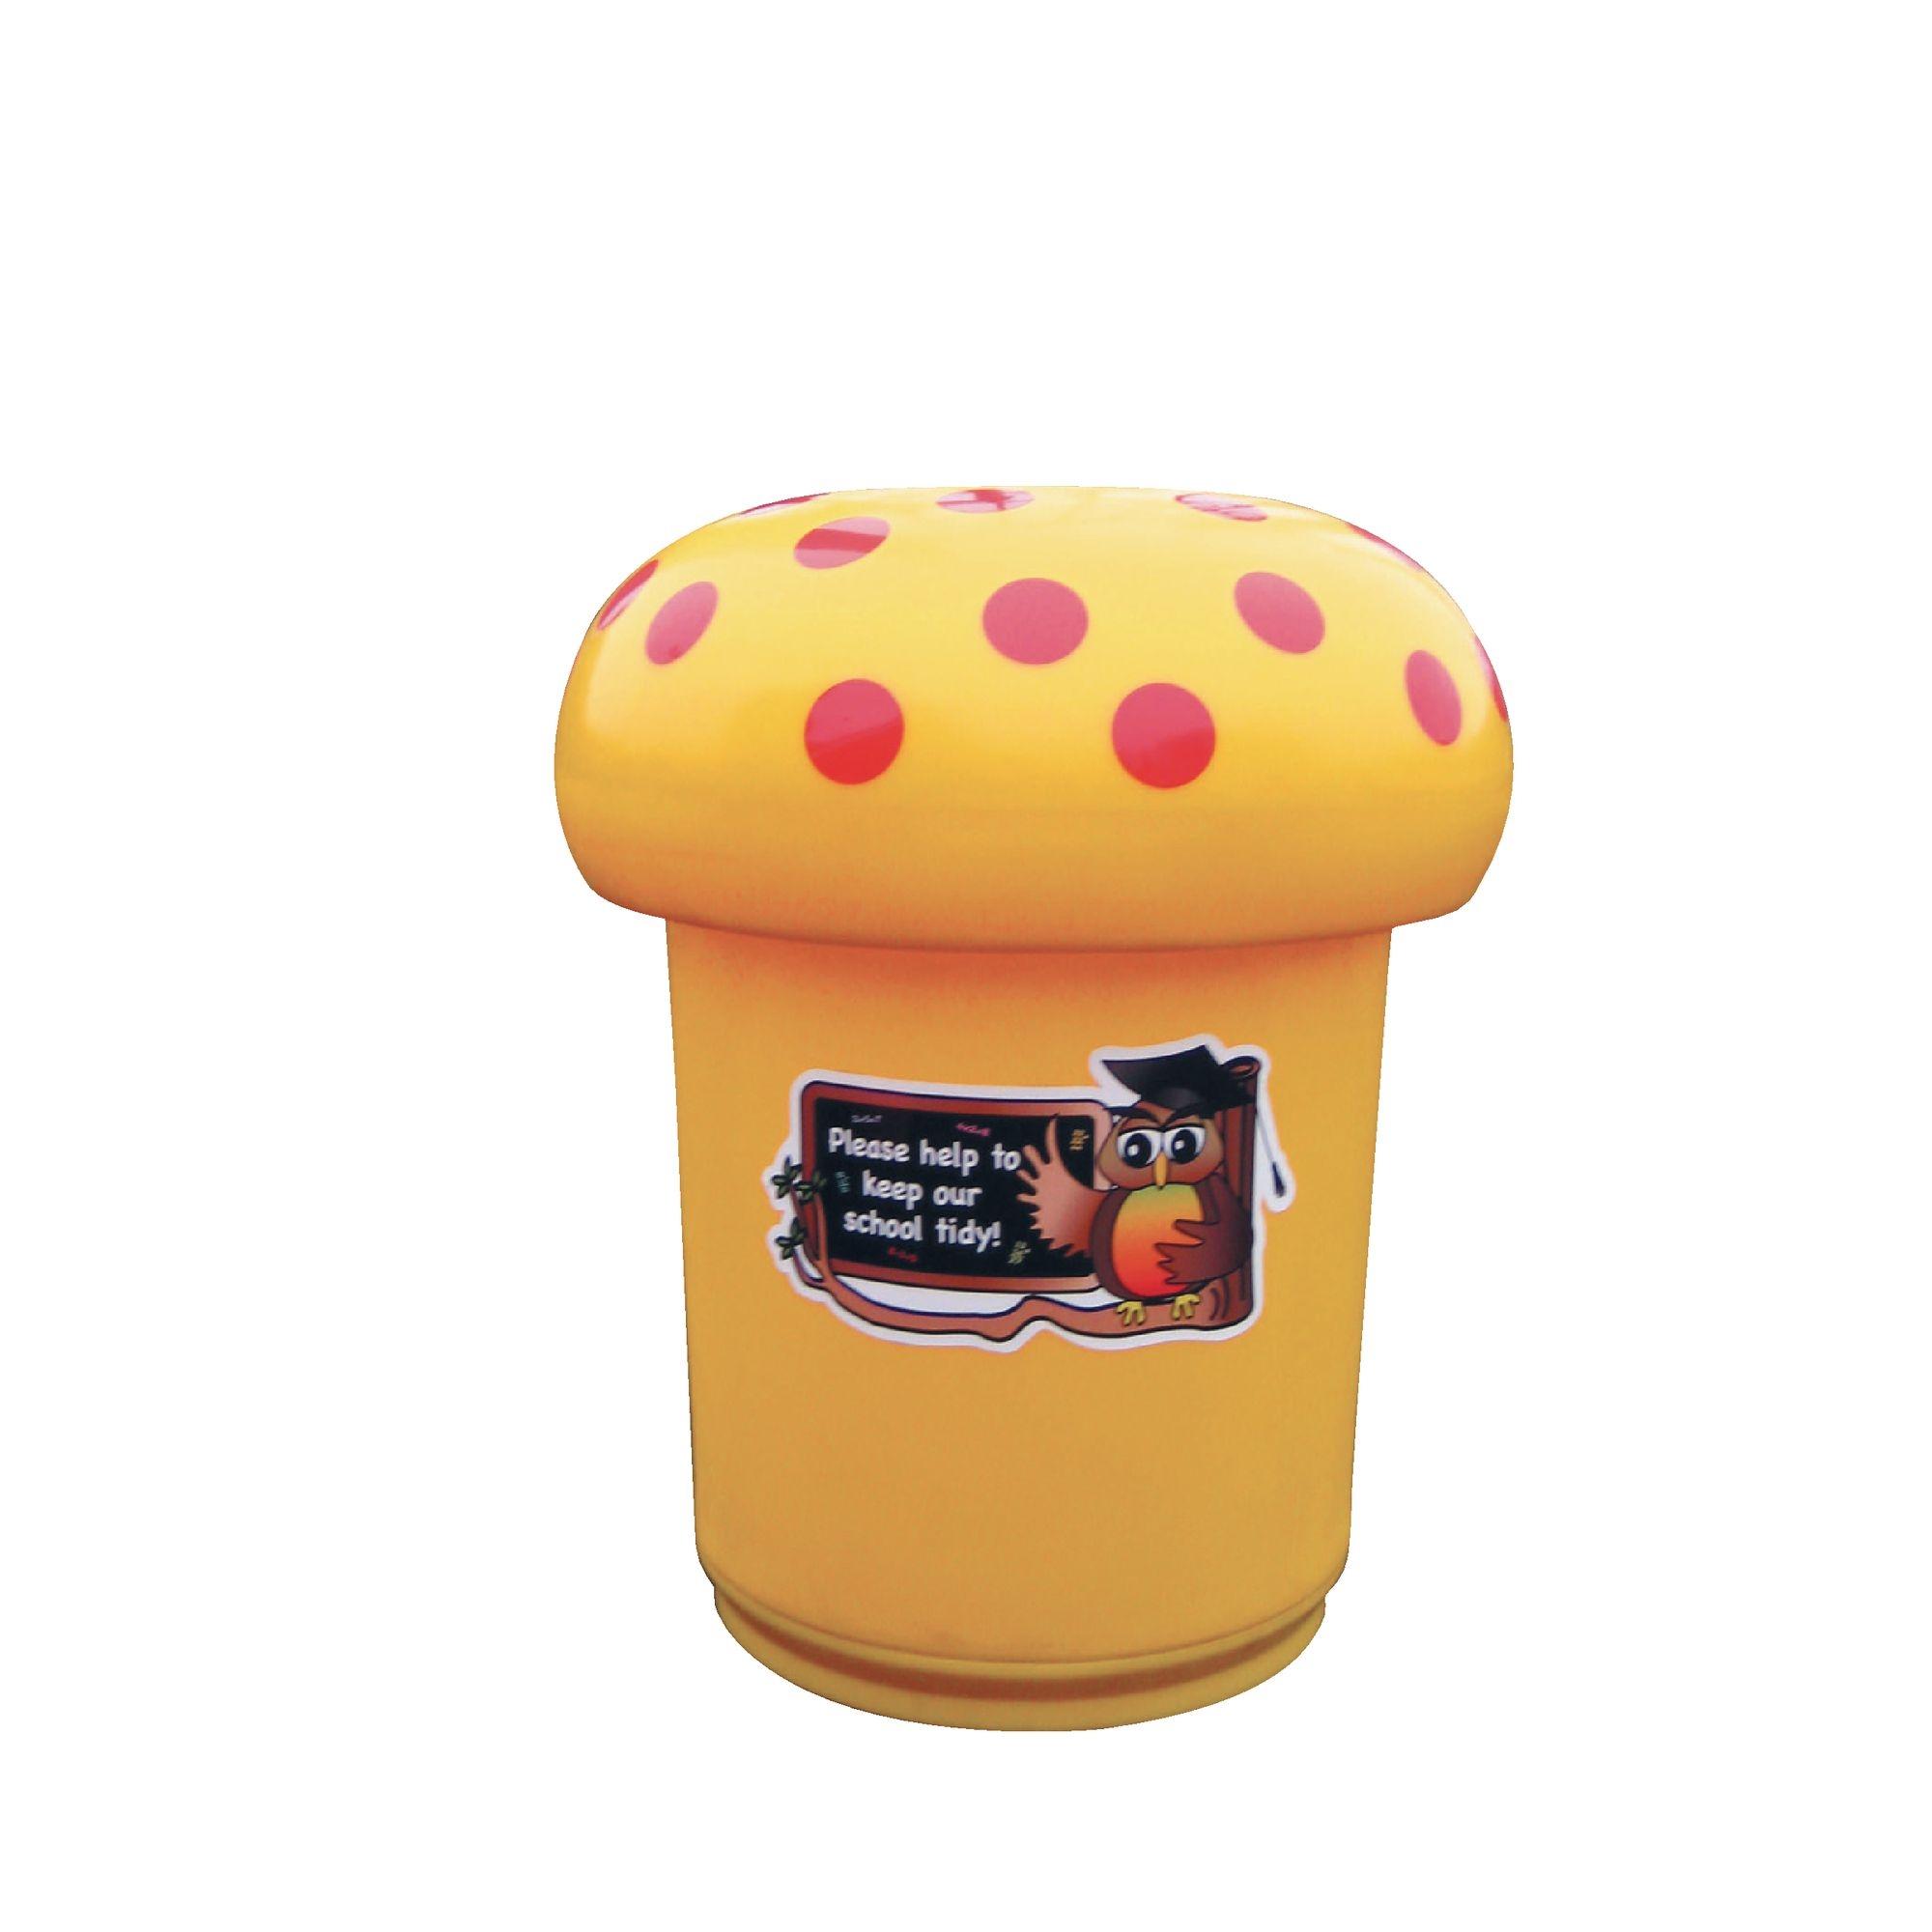 Mushroom Litter Bins Owl Graphics Orange